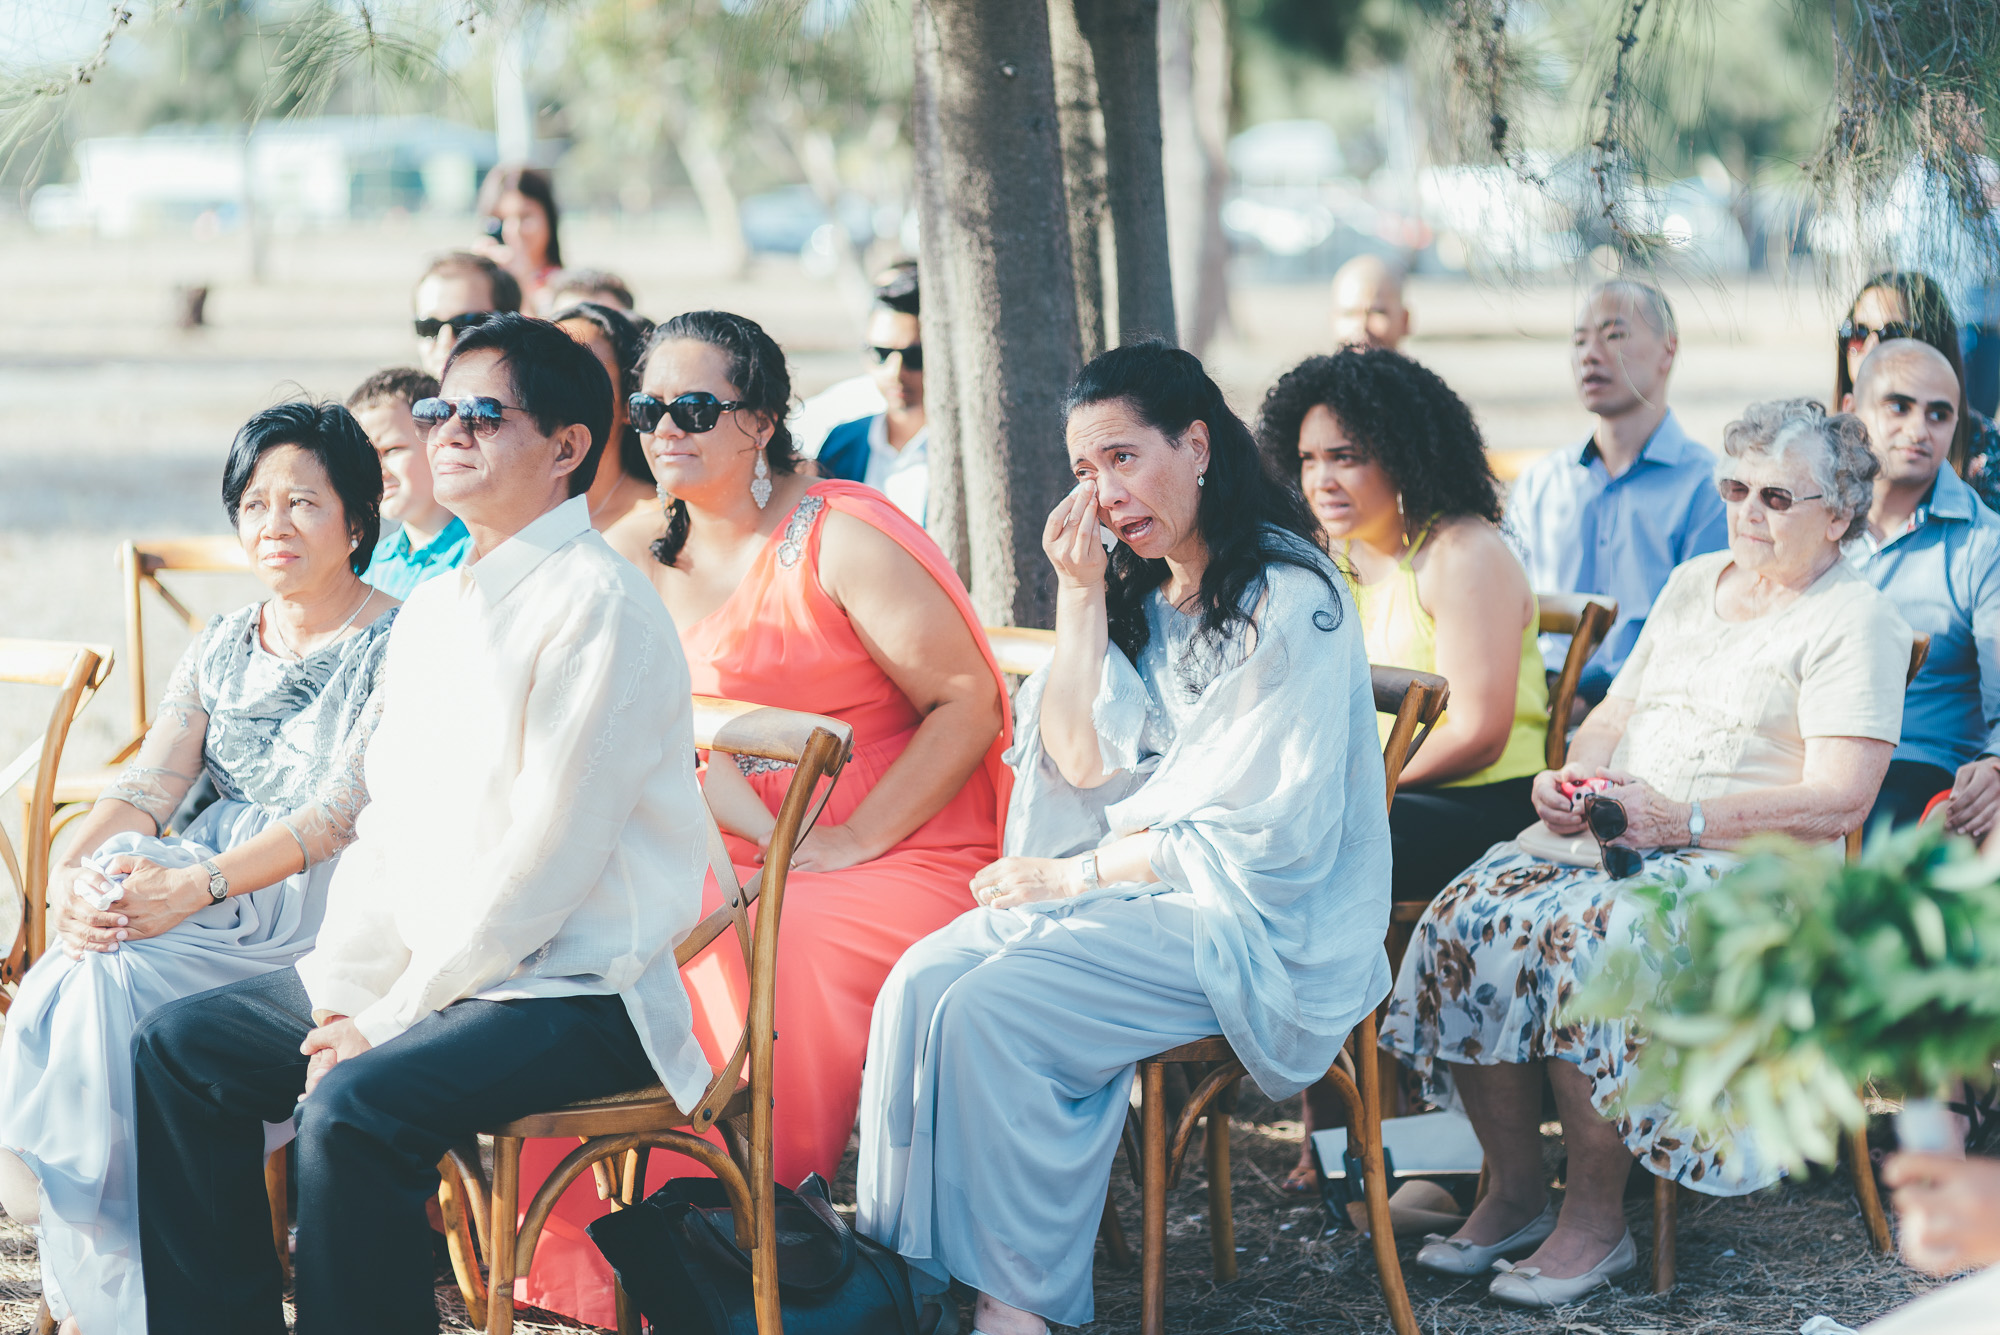 wedding-photographer-outdoor-casual-styled-los-angeles-australia-california-international-earthbound -41.jpg